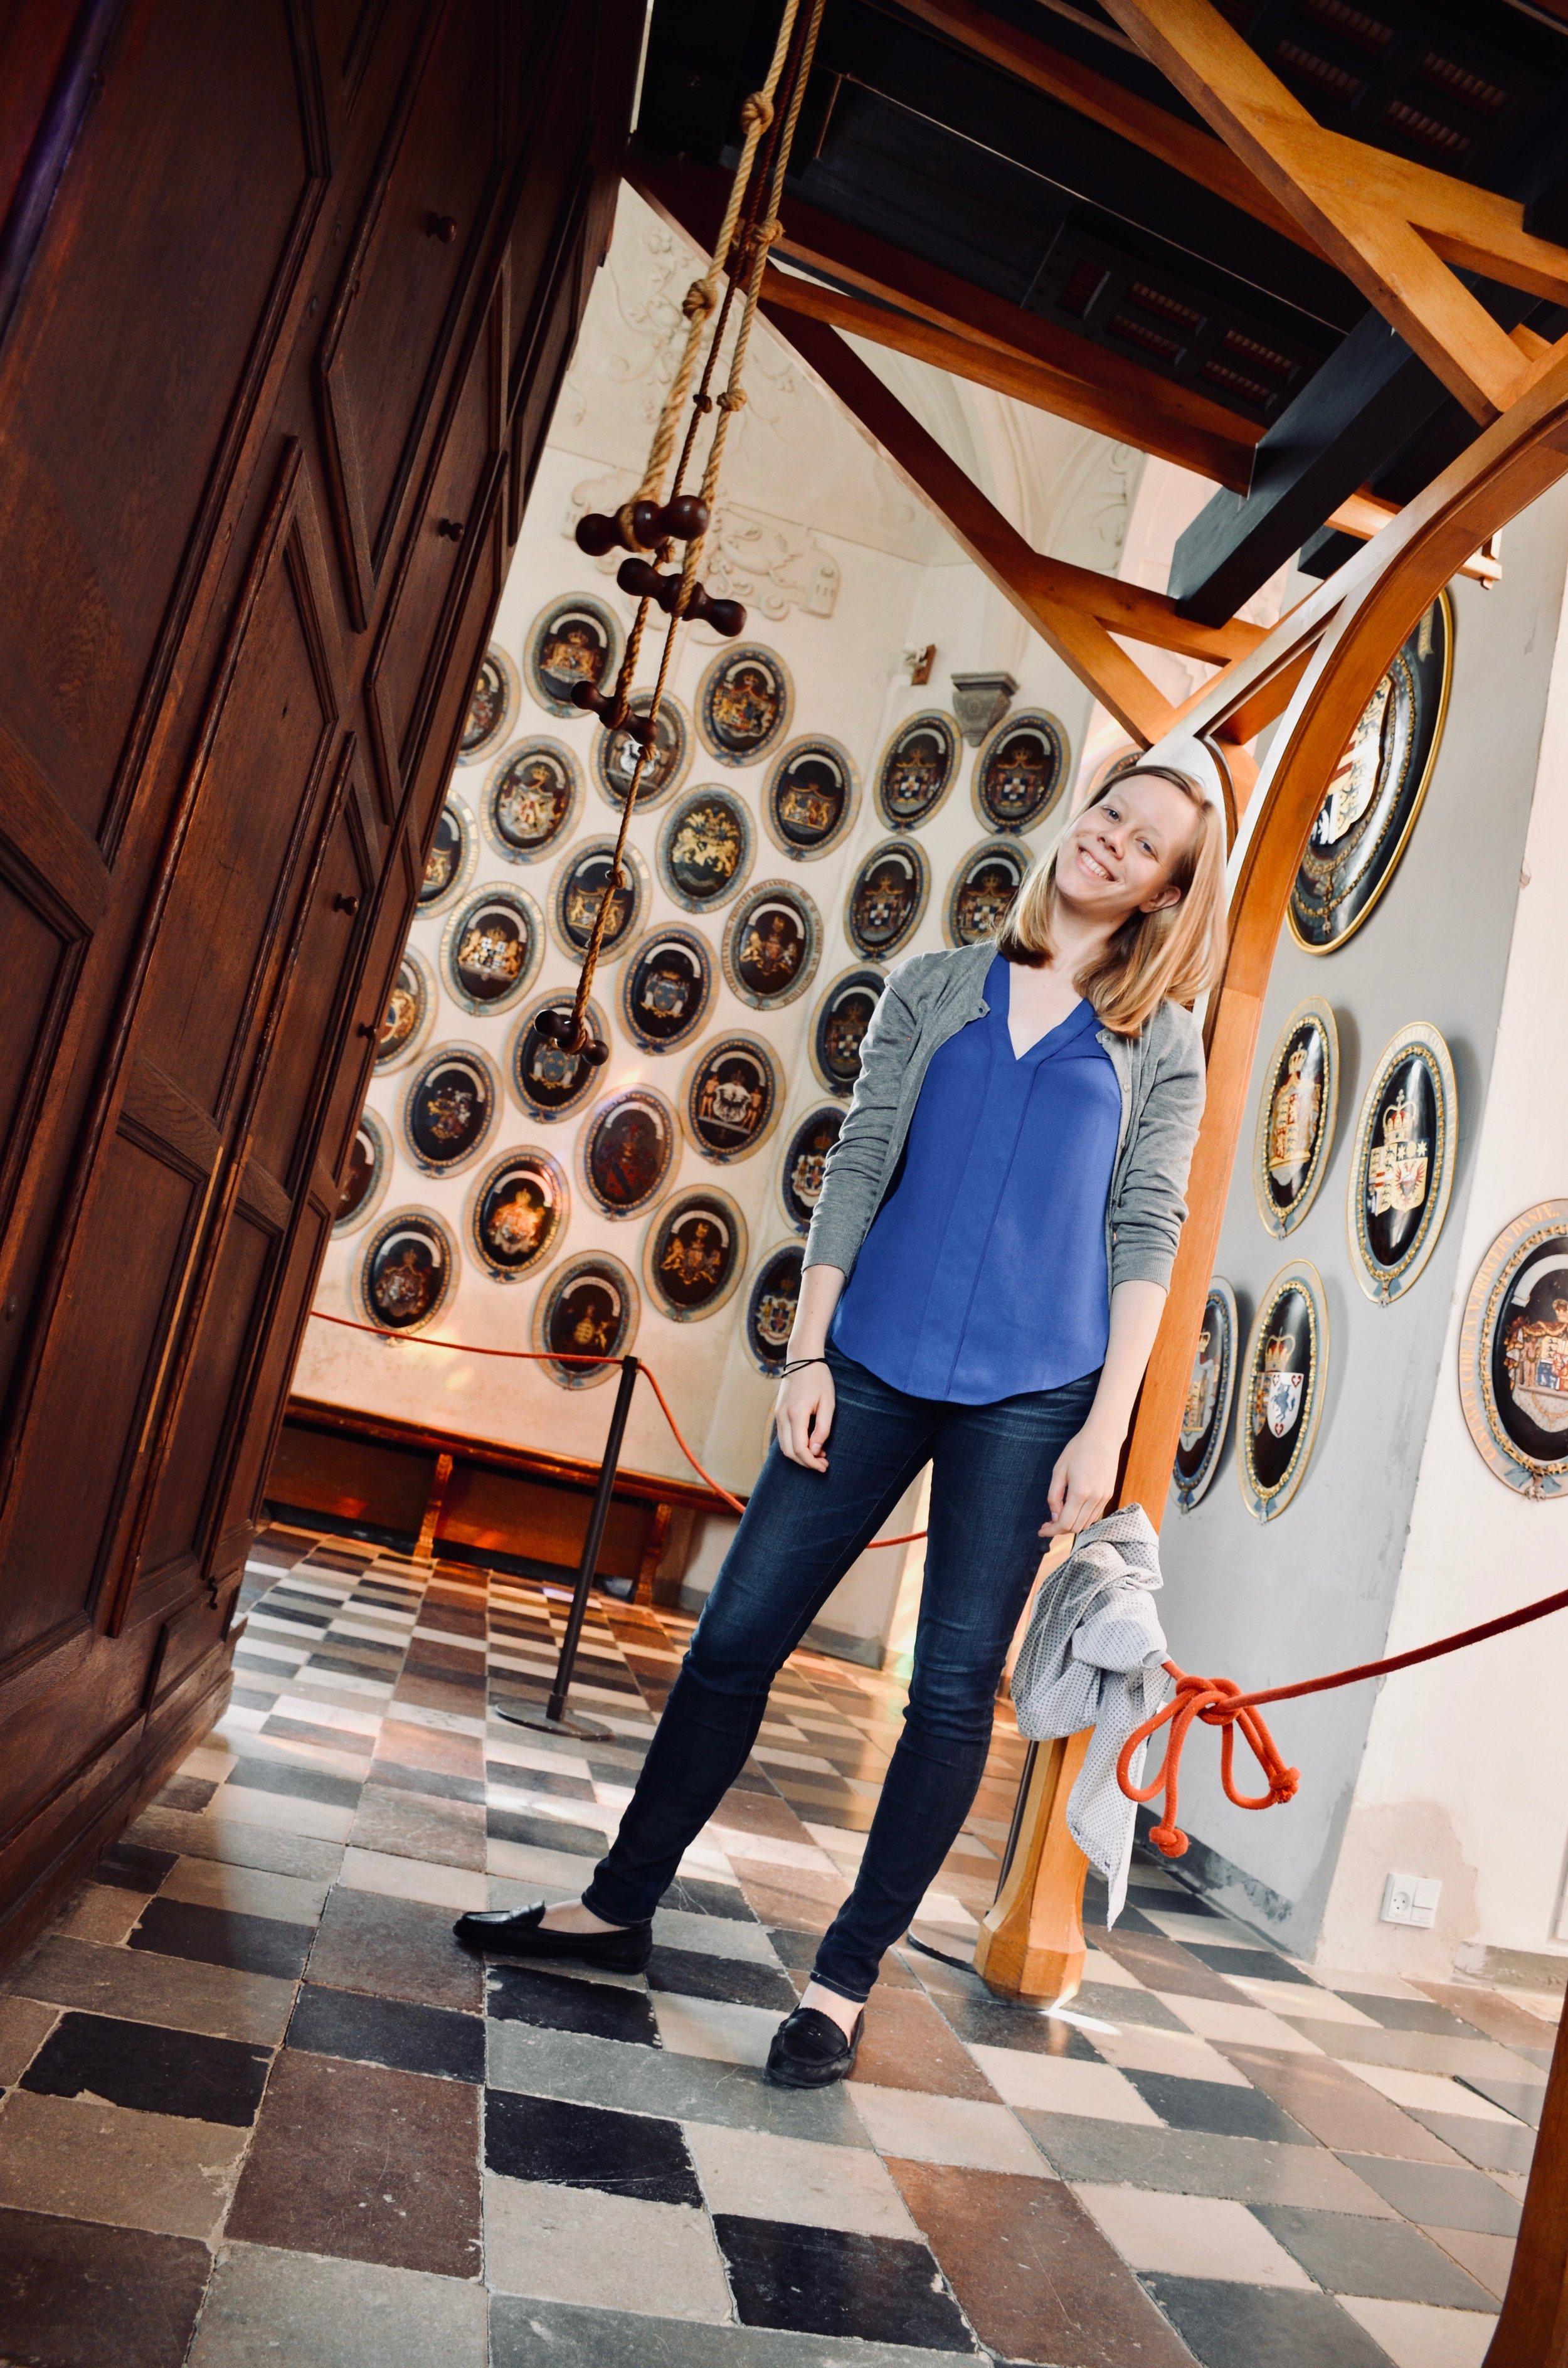 Laura takes a break from pumping the bellows, 1610 Compenius organ, Frederiksborg Castle, Hillerød, Denmark.